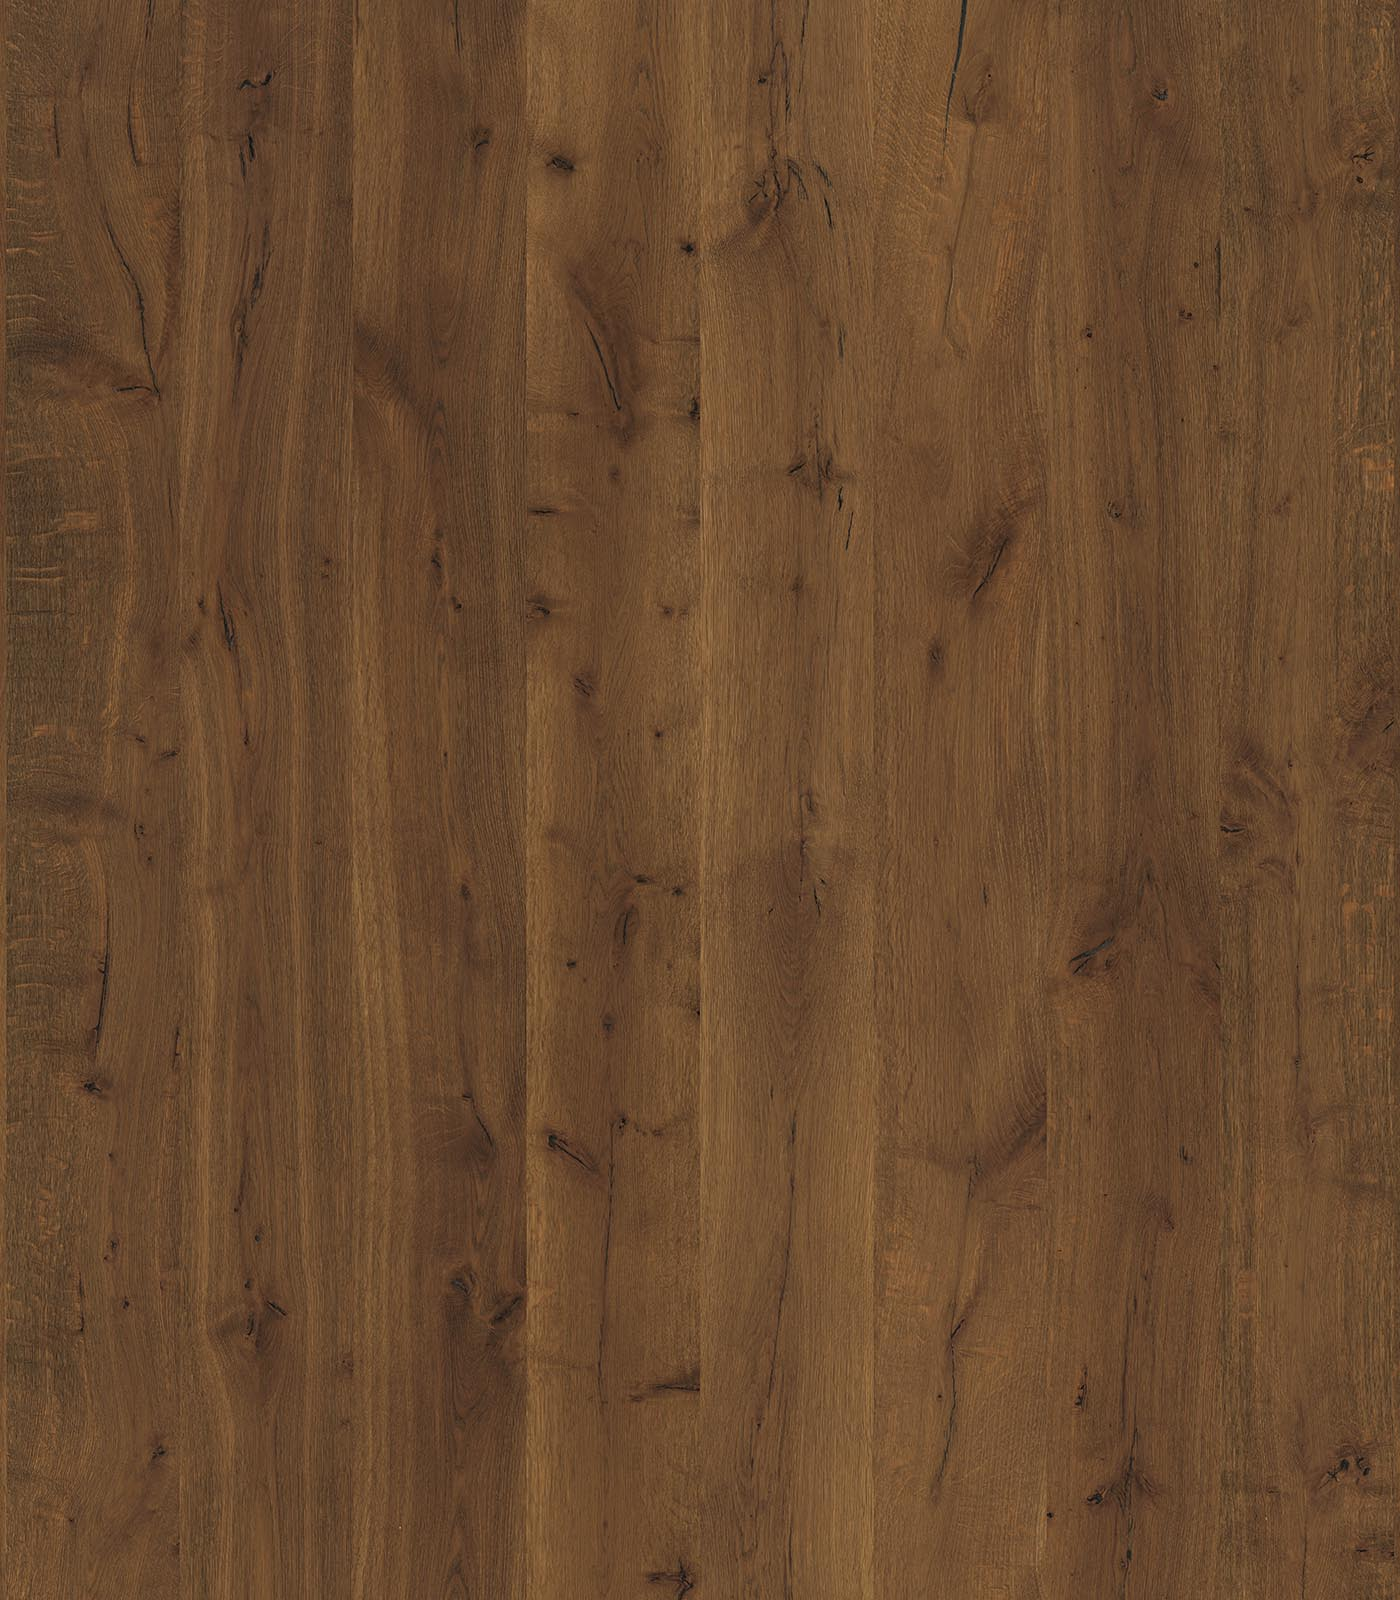 San Andreas-European Oak Floors-Variante collection - flat